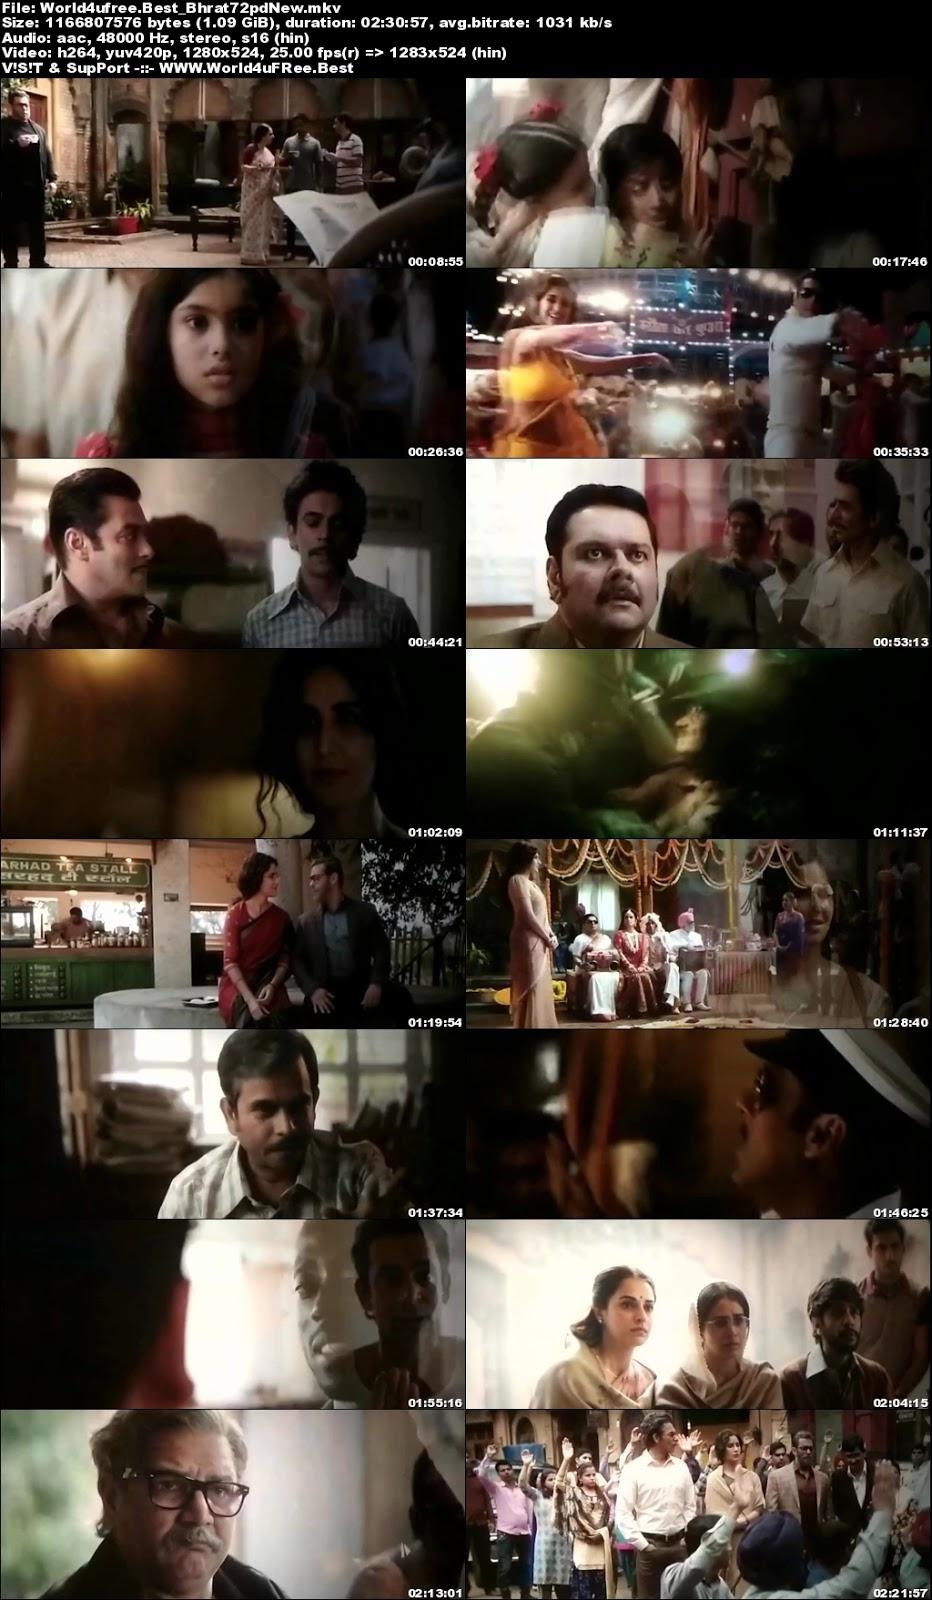 Slaman Khan's Bharat (2019) Pre-DVDRip Leaked on World4UFree